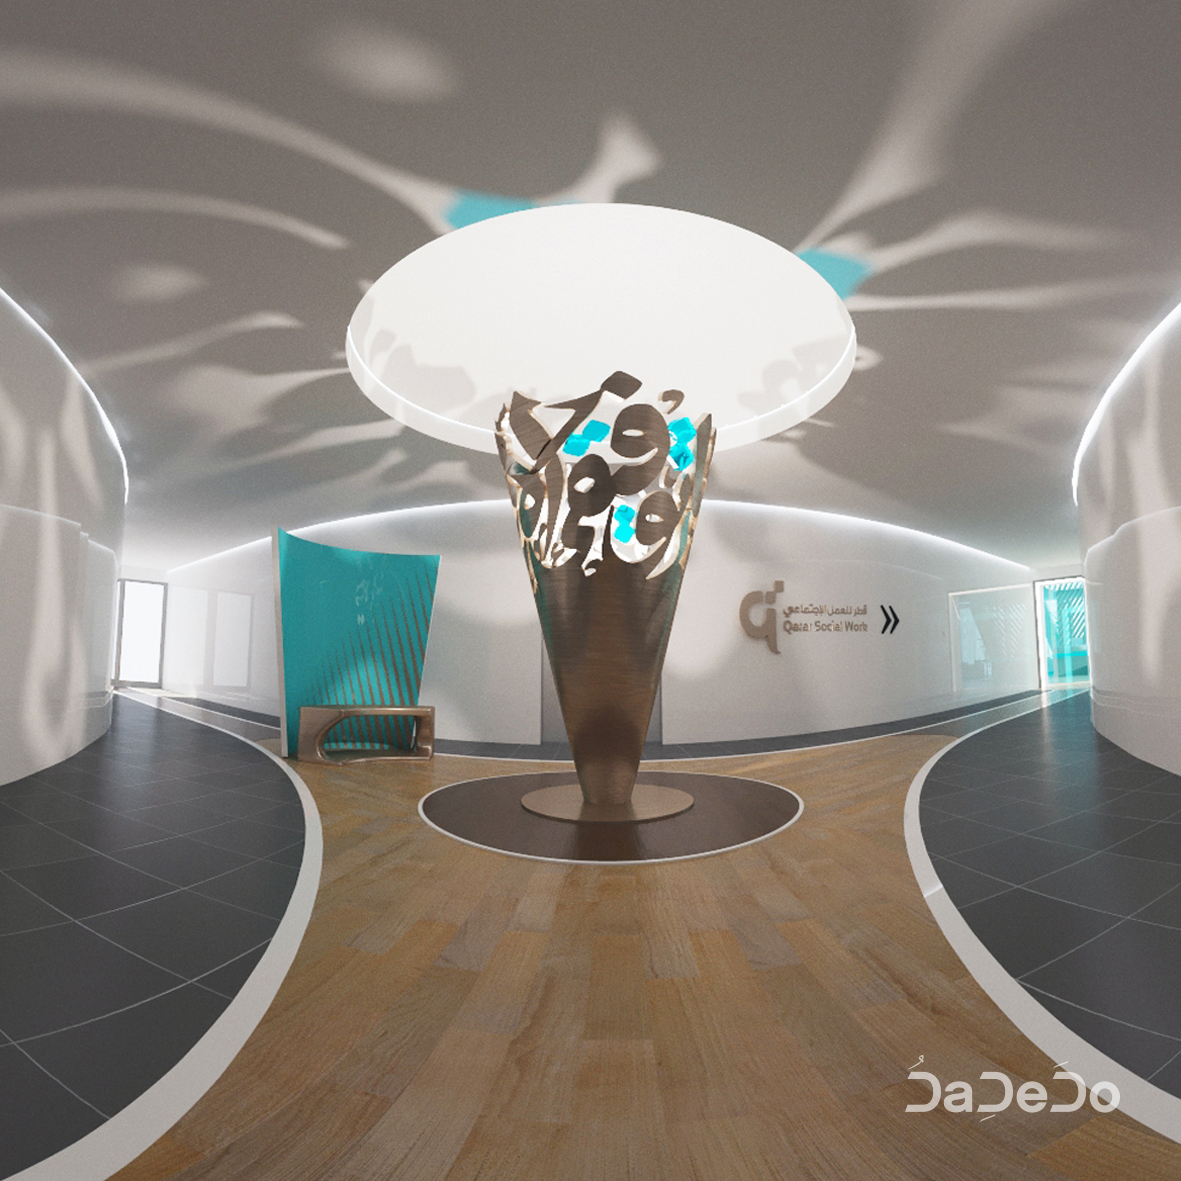 Qatar Social Corporate Environment Design